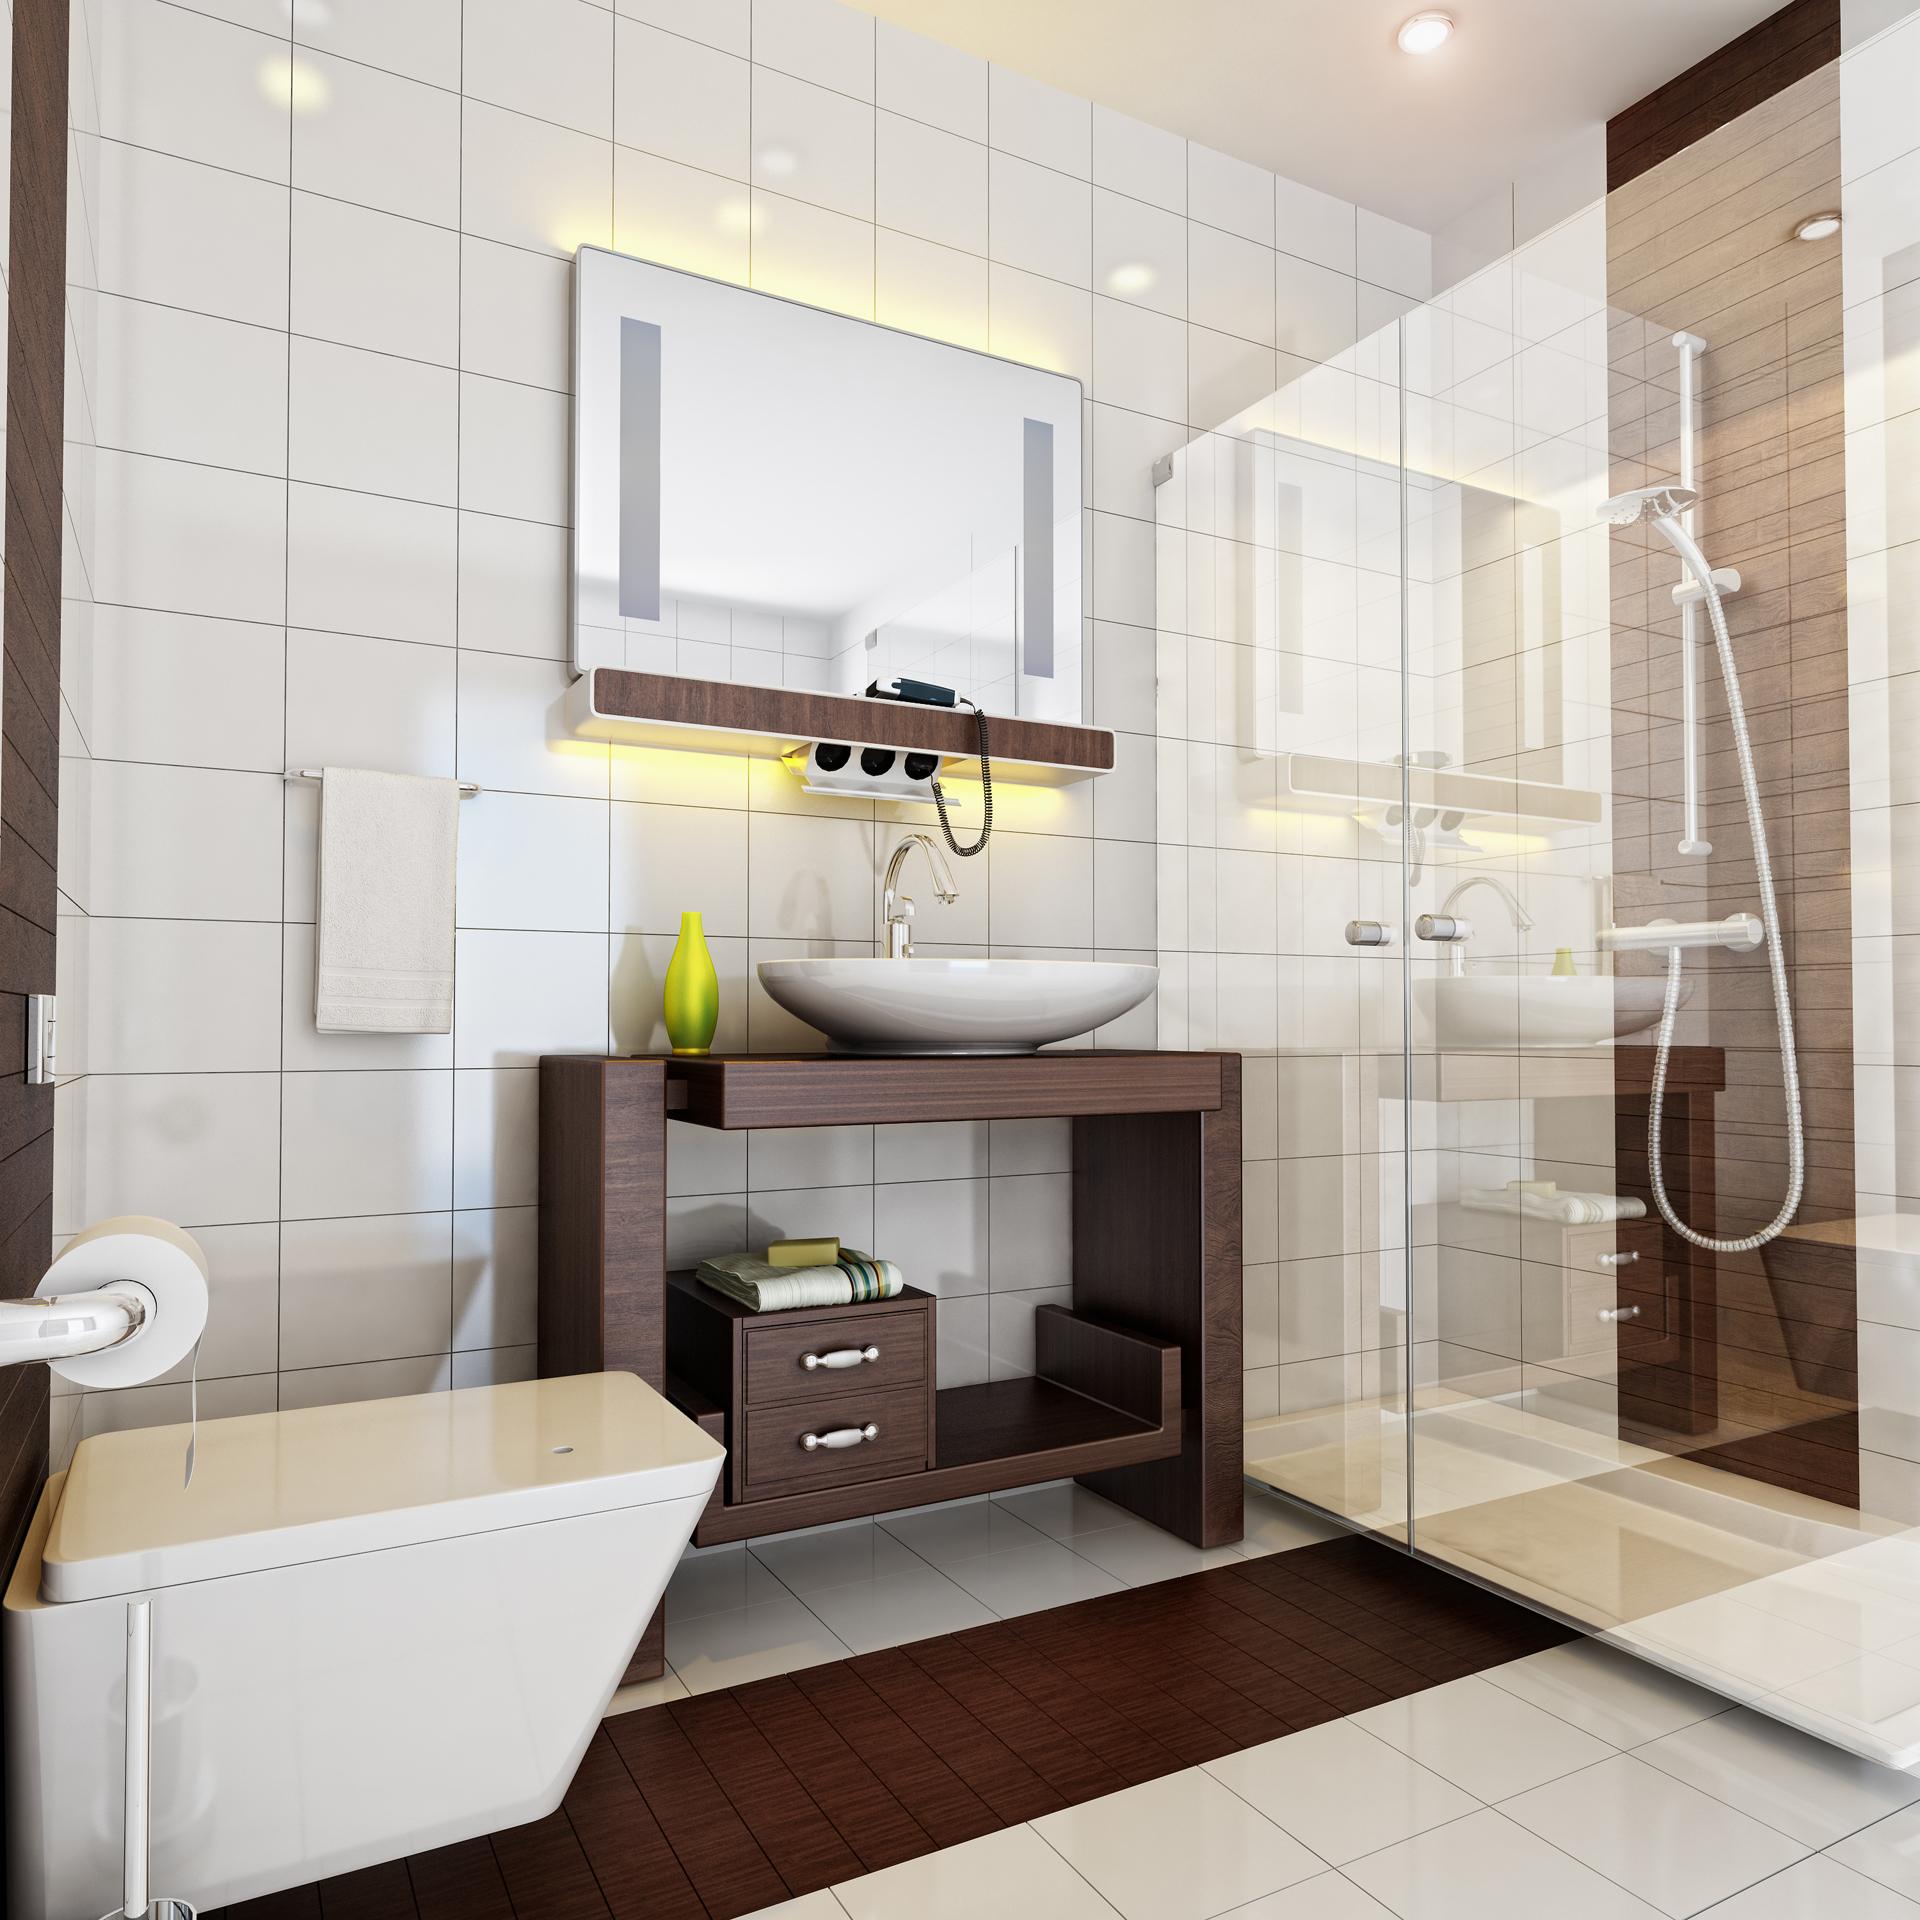 Vray İç Mekan Banyo Render